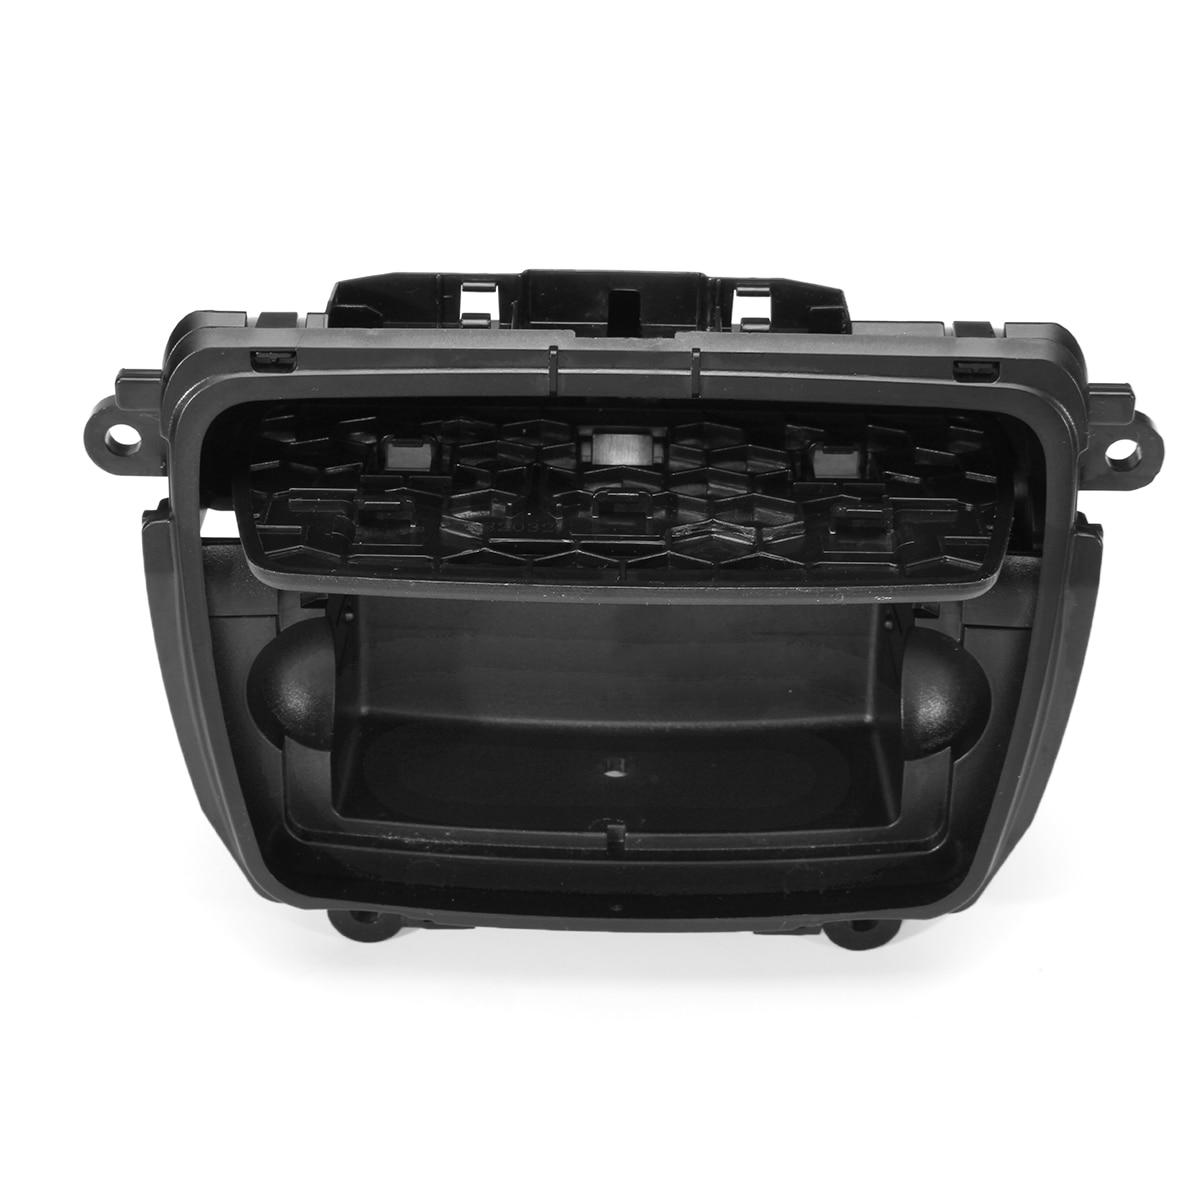 New Automobile Ashtrays Black Plastic Center Console Car Ashtray Assembly Box Fits for BMW 5 Series F10 F11 F18 520 51169206347|Car Ashtray| |  - title=